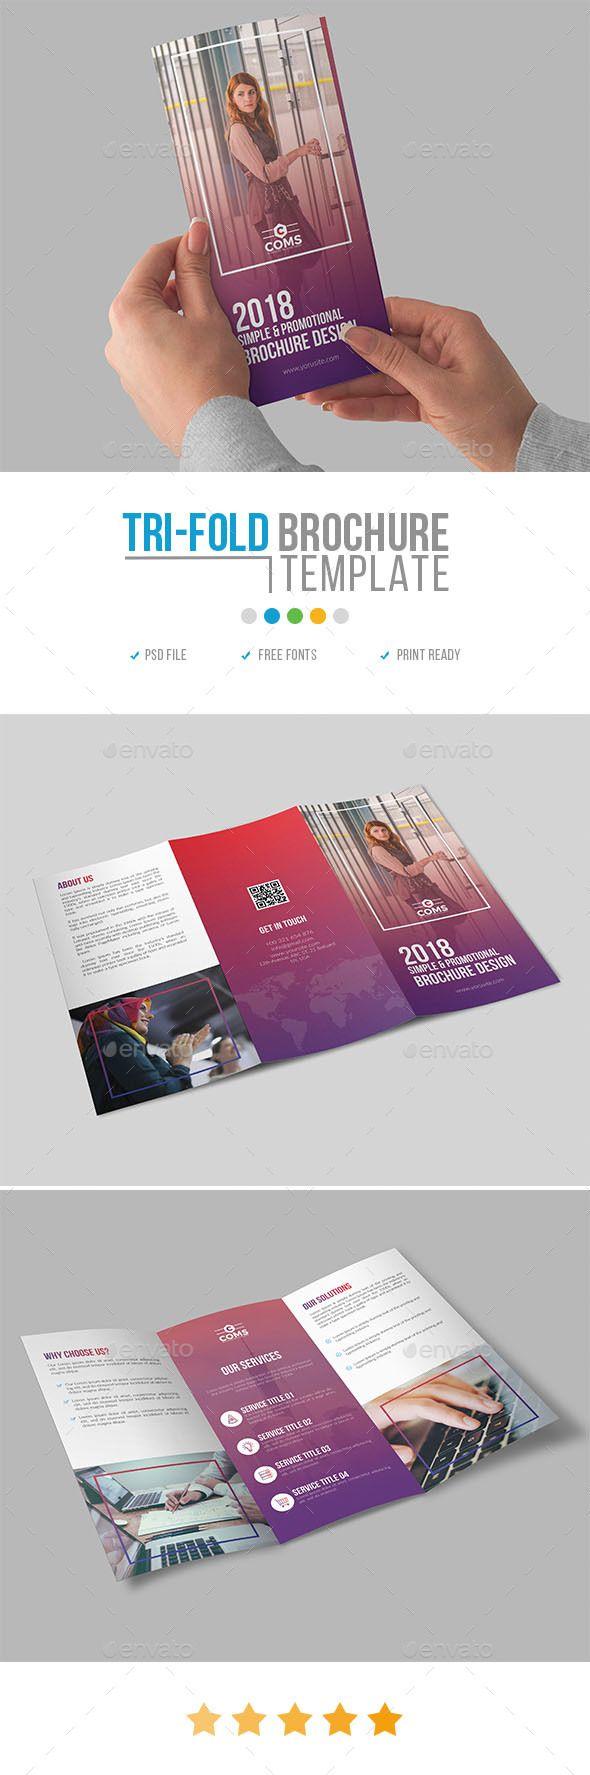 Corporate #Trifold #Brochure Template 26 - Corporate Brochures